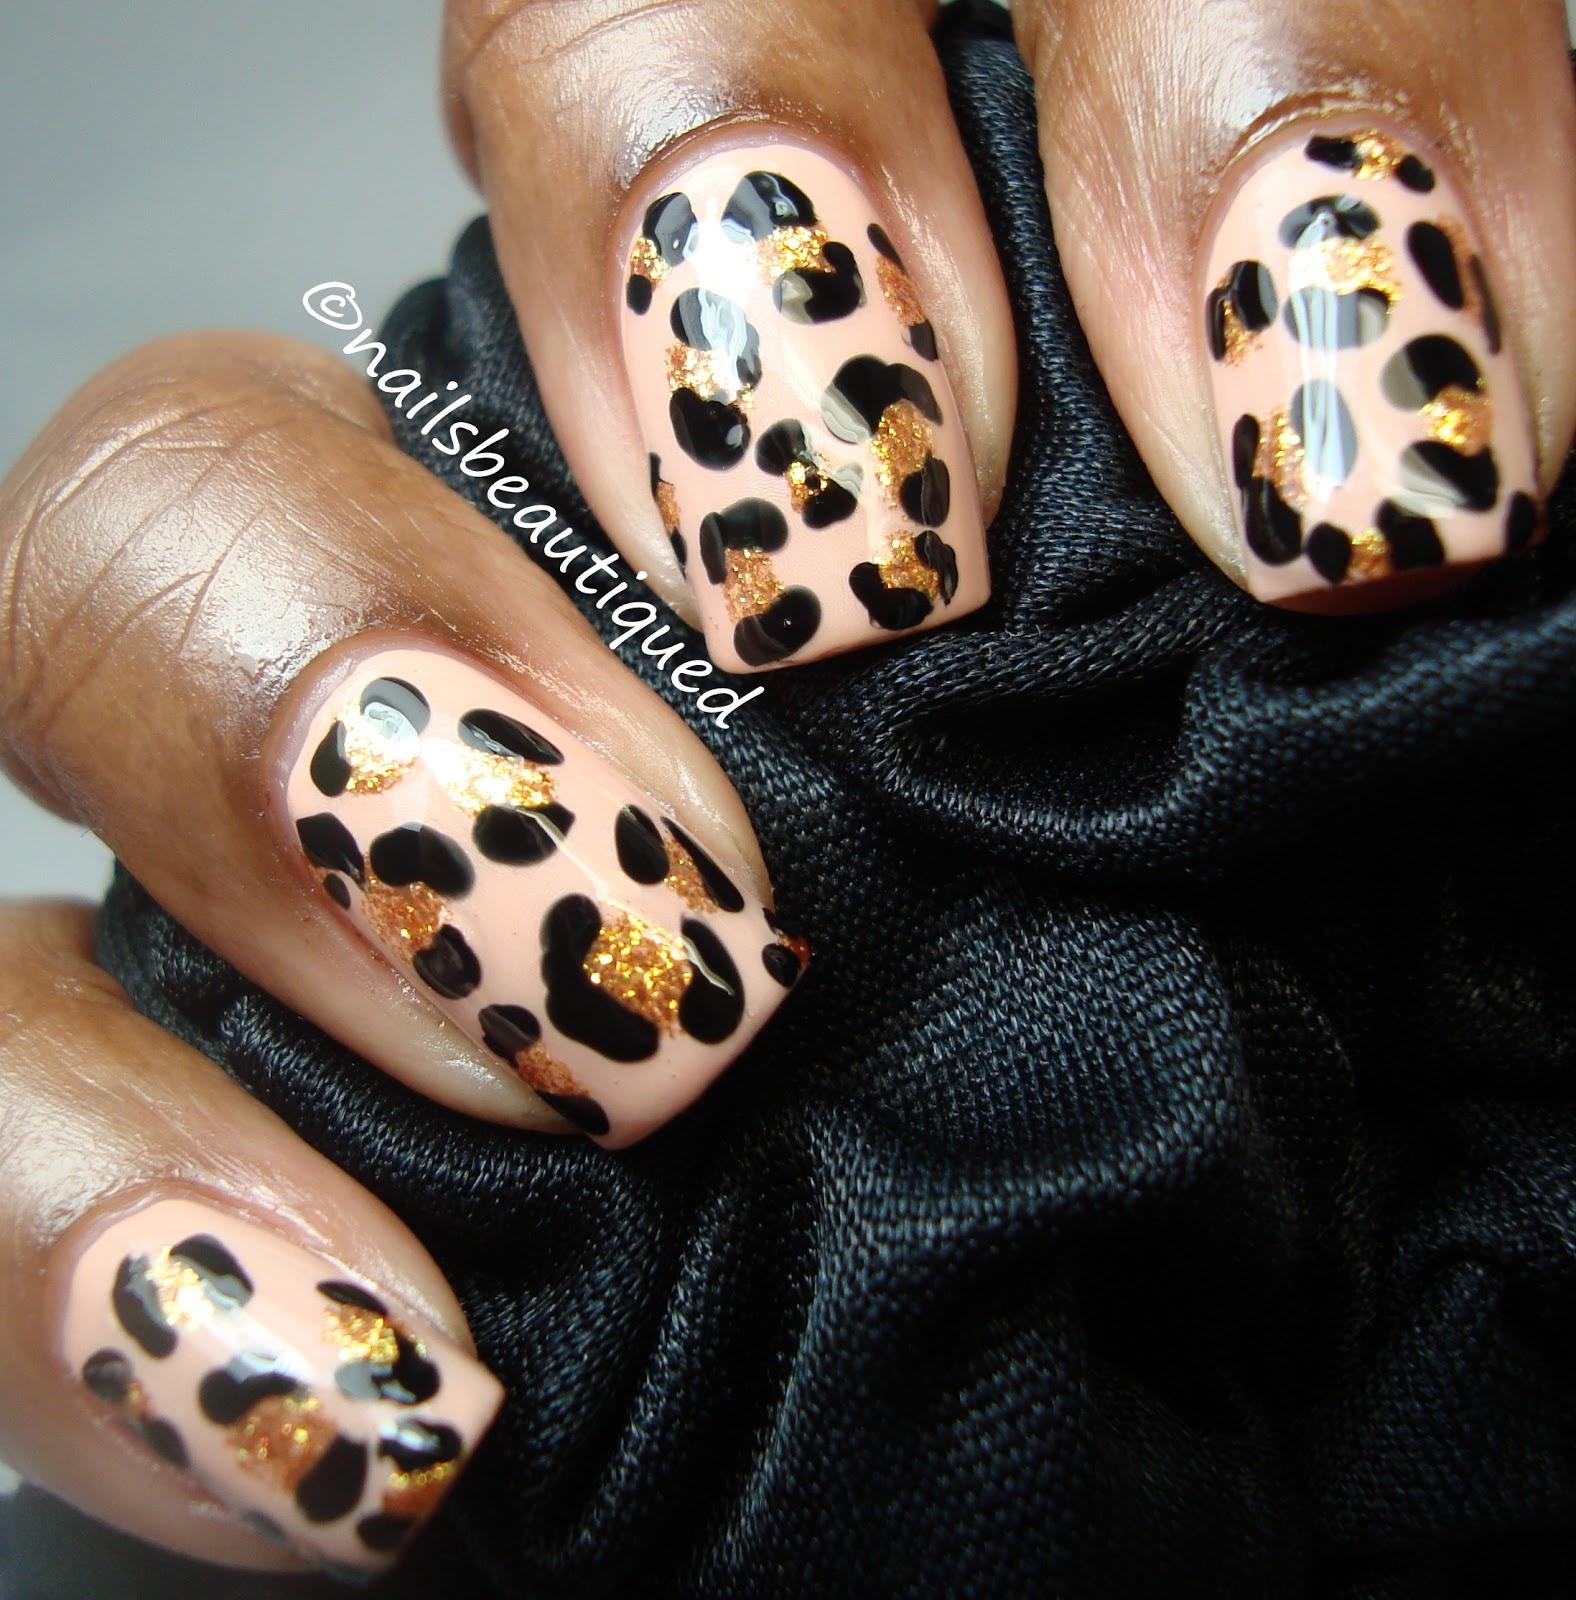 unbitten polish: Pink Wednesday, Leopard Print Nails